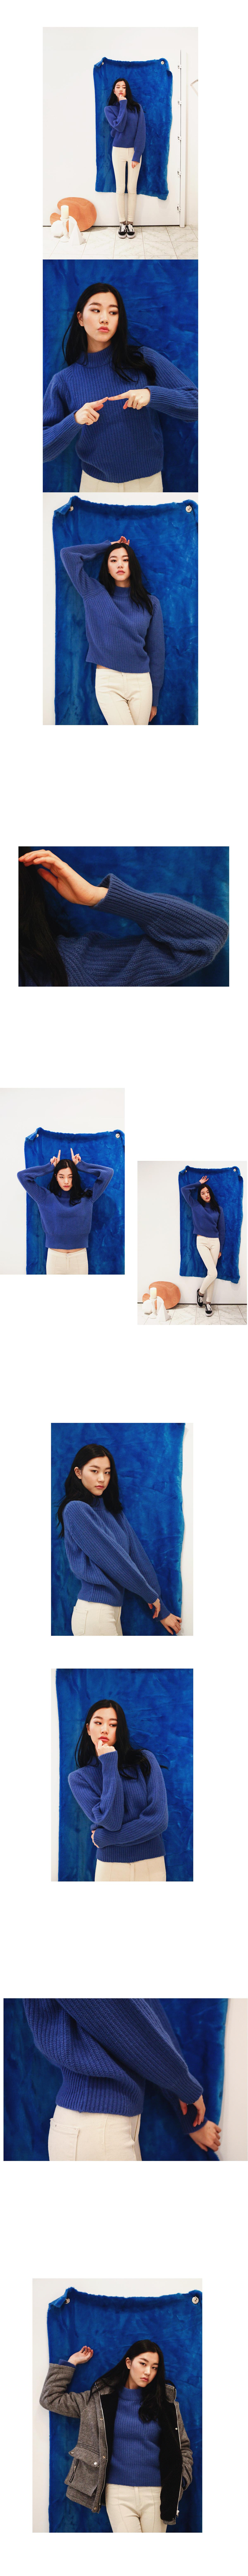 Pastel Angora Knit Top  | Fashion To Any